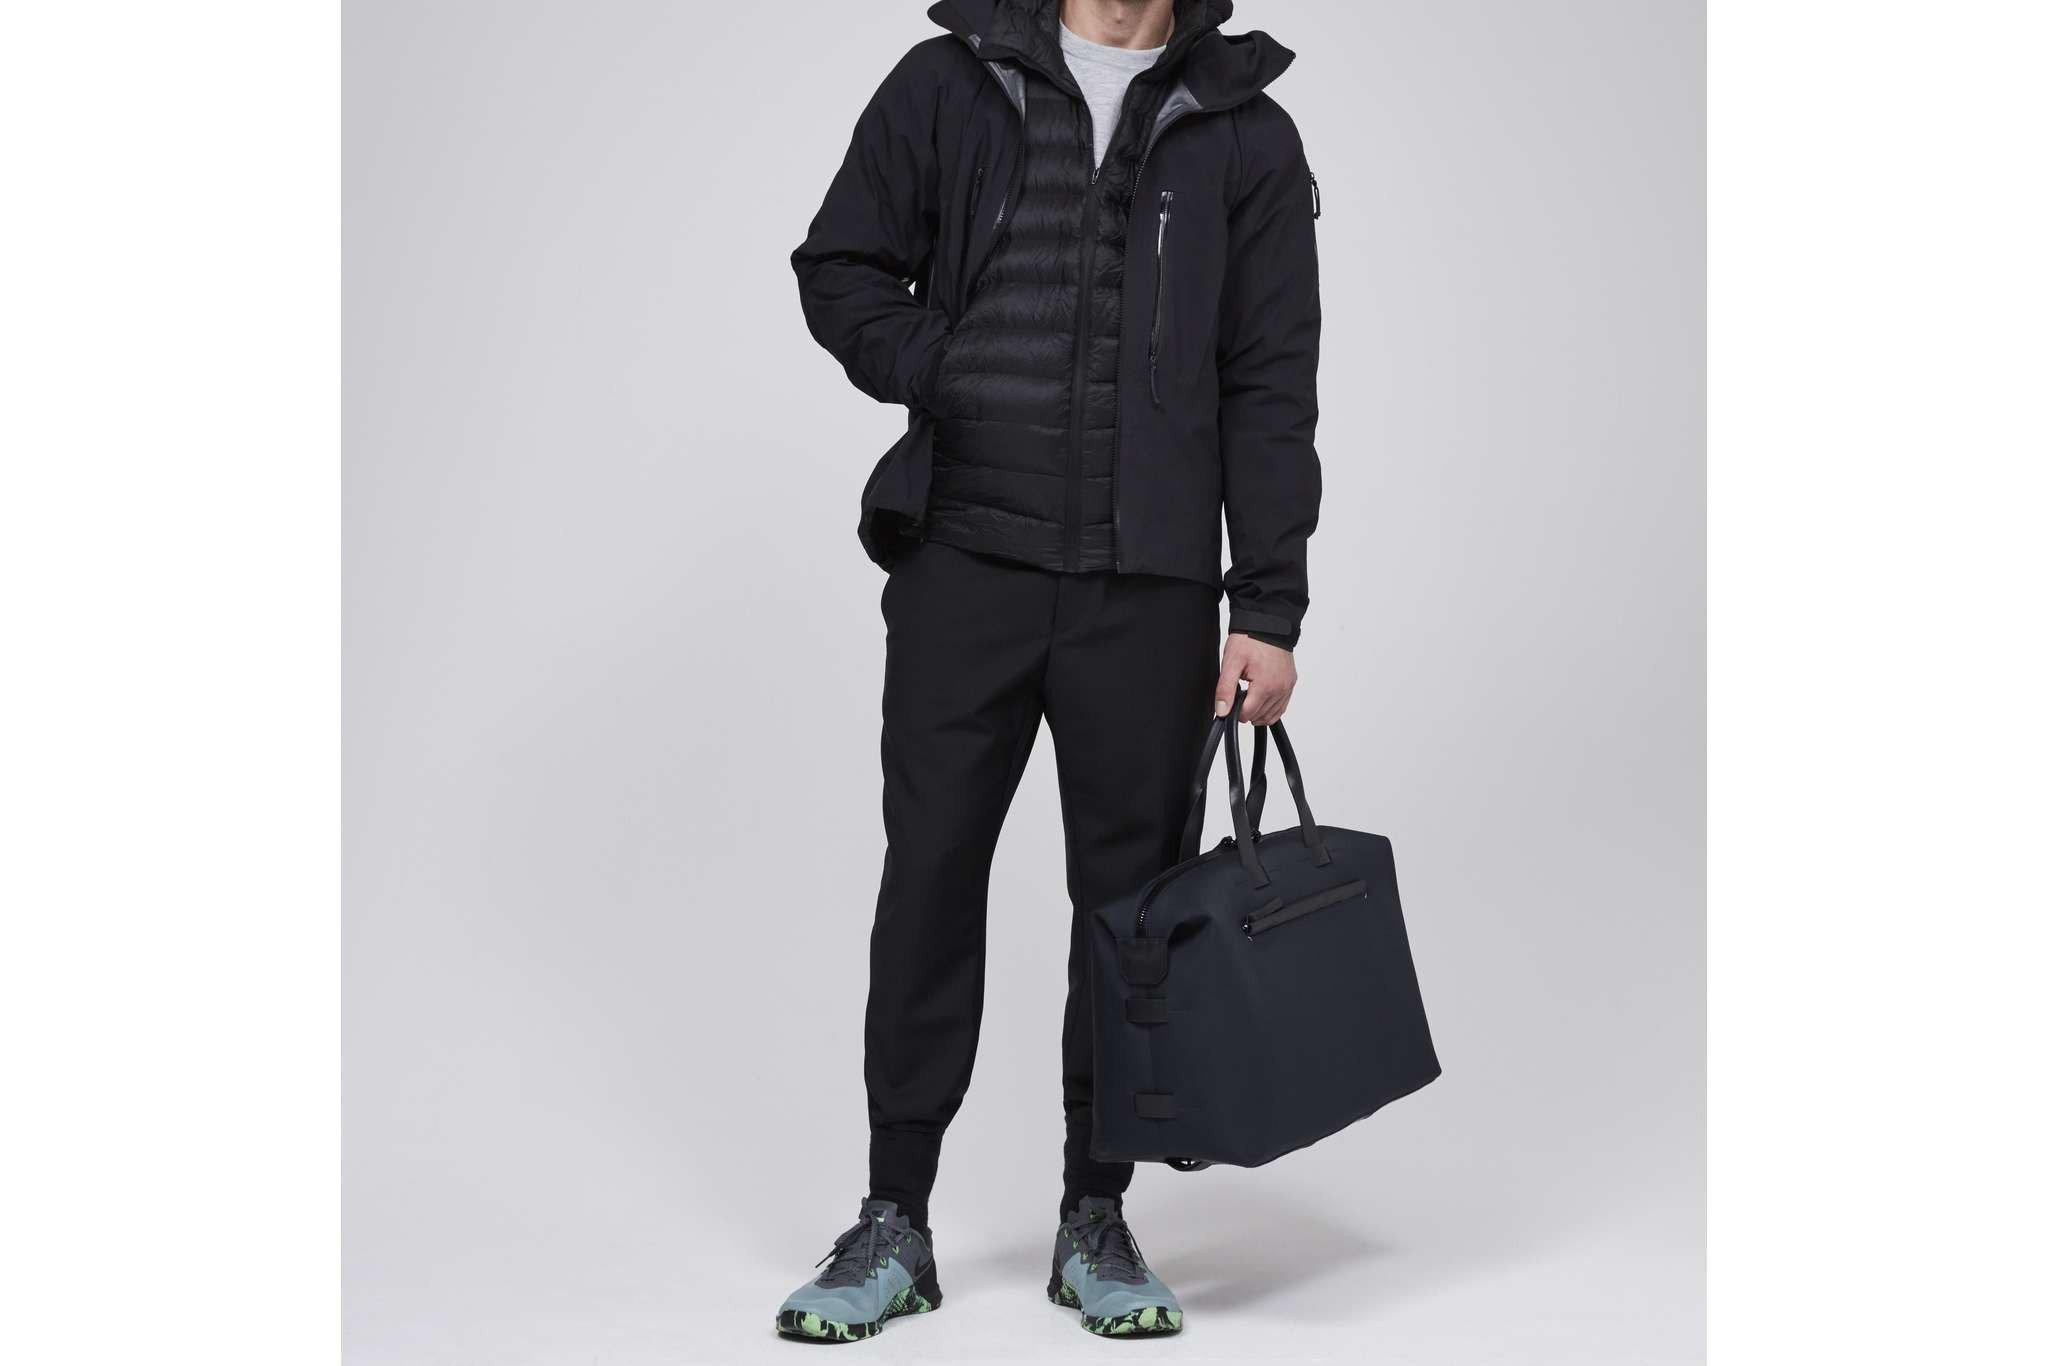 mens_fabric_leather_weekend_bag_MW4291.jpg